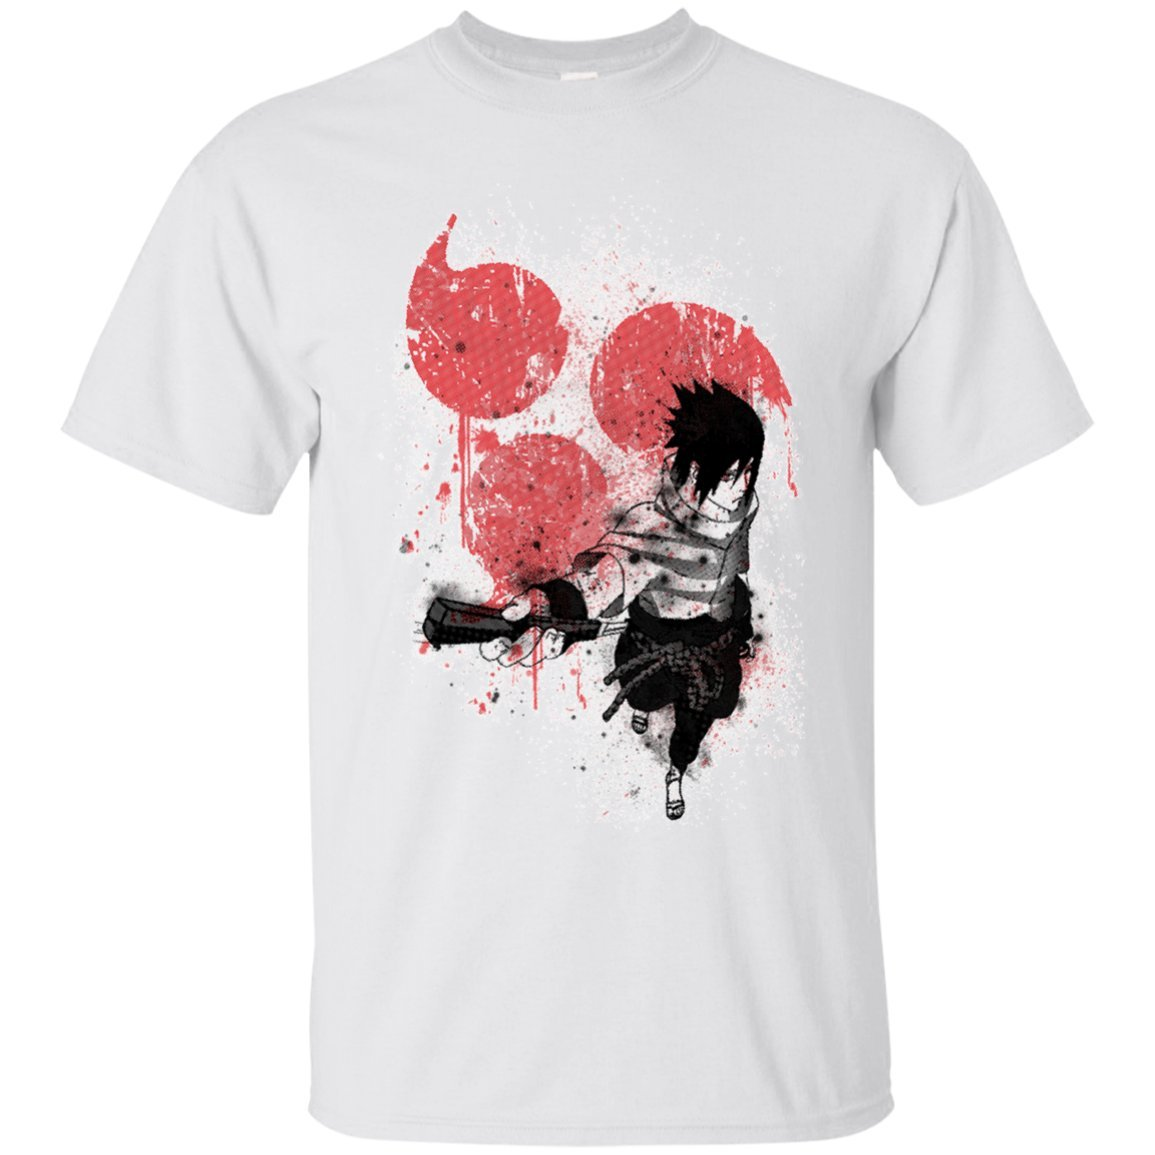 9fece1bb7 Amazon.com: Funny Naruto Apparel -Last Uchiha Member Sasuke Naruto T-Shirt:  Clothing